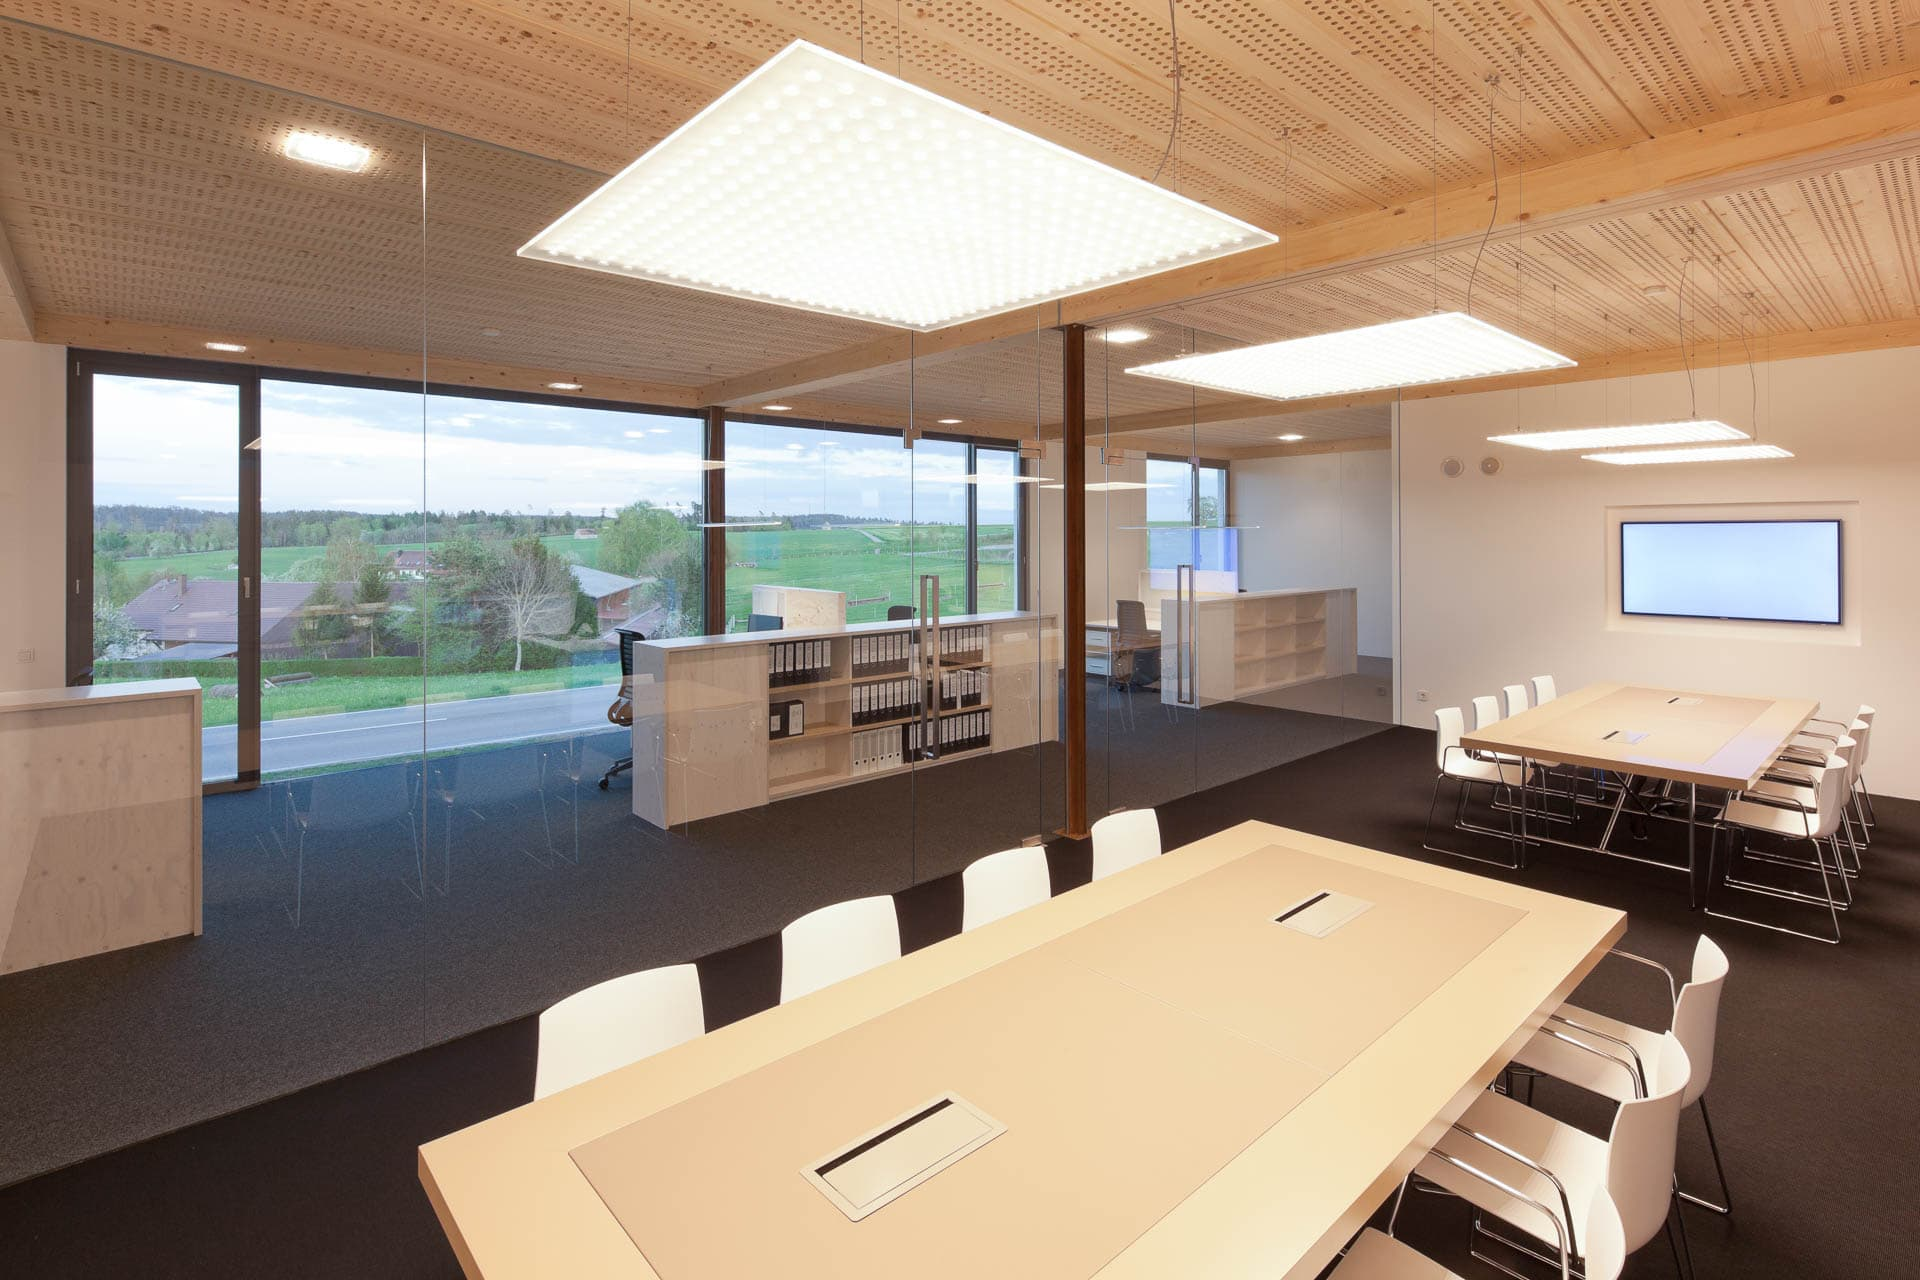 Konferenzraum mit Nimbus LED Beleuchtung